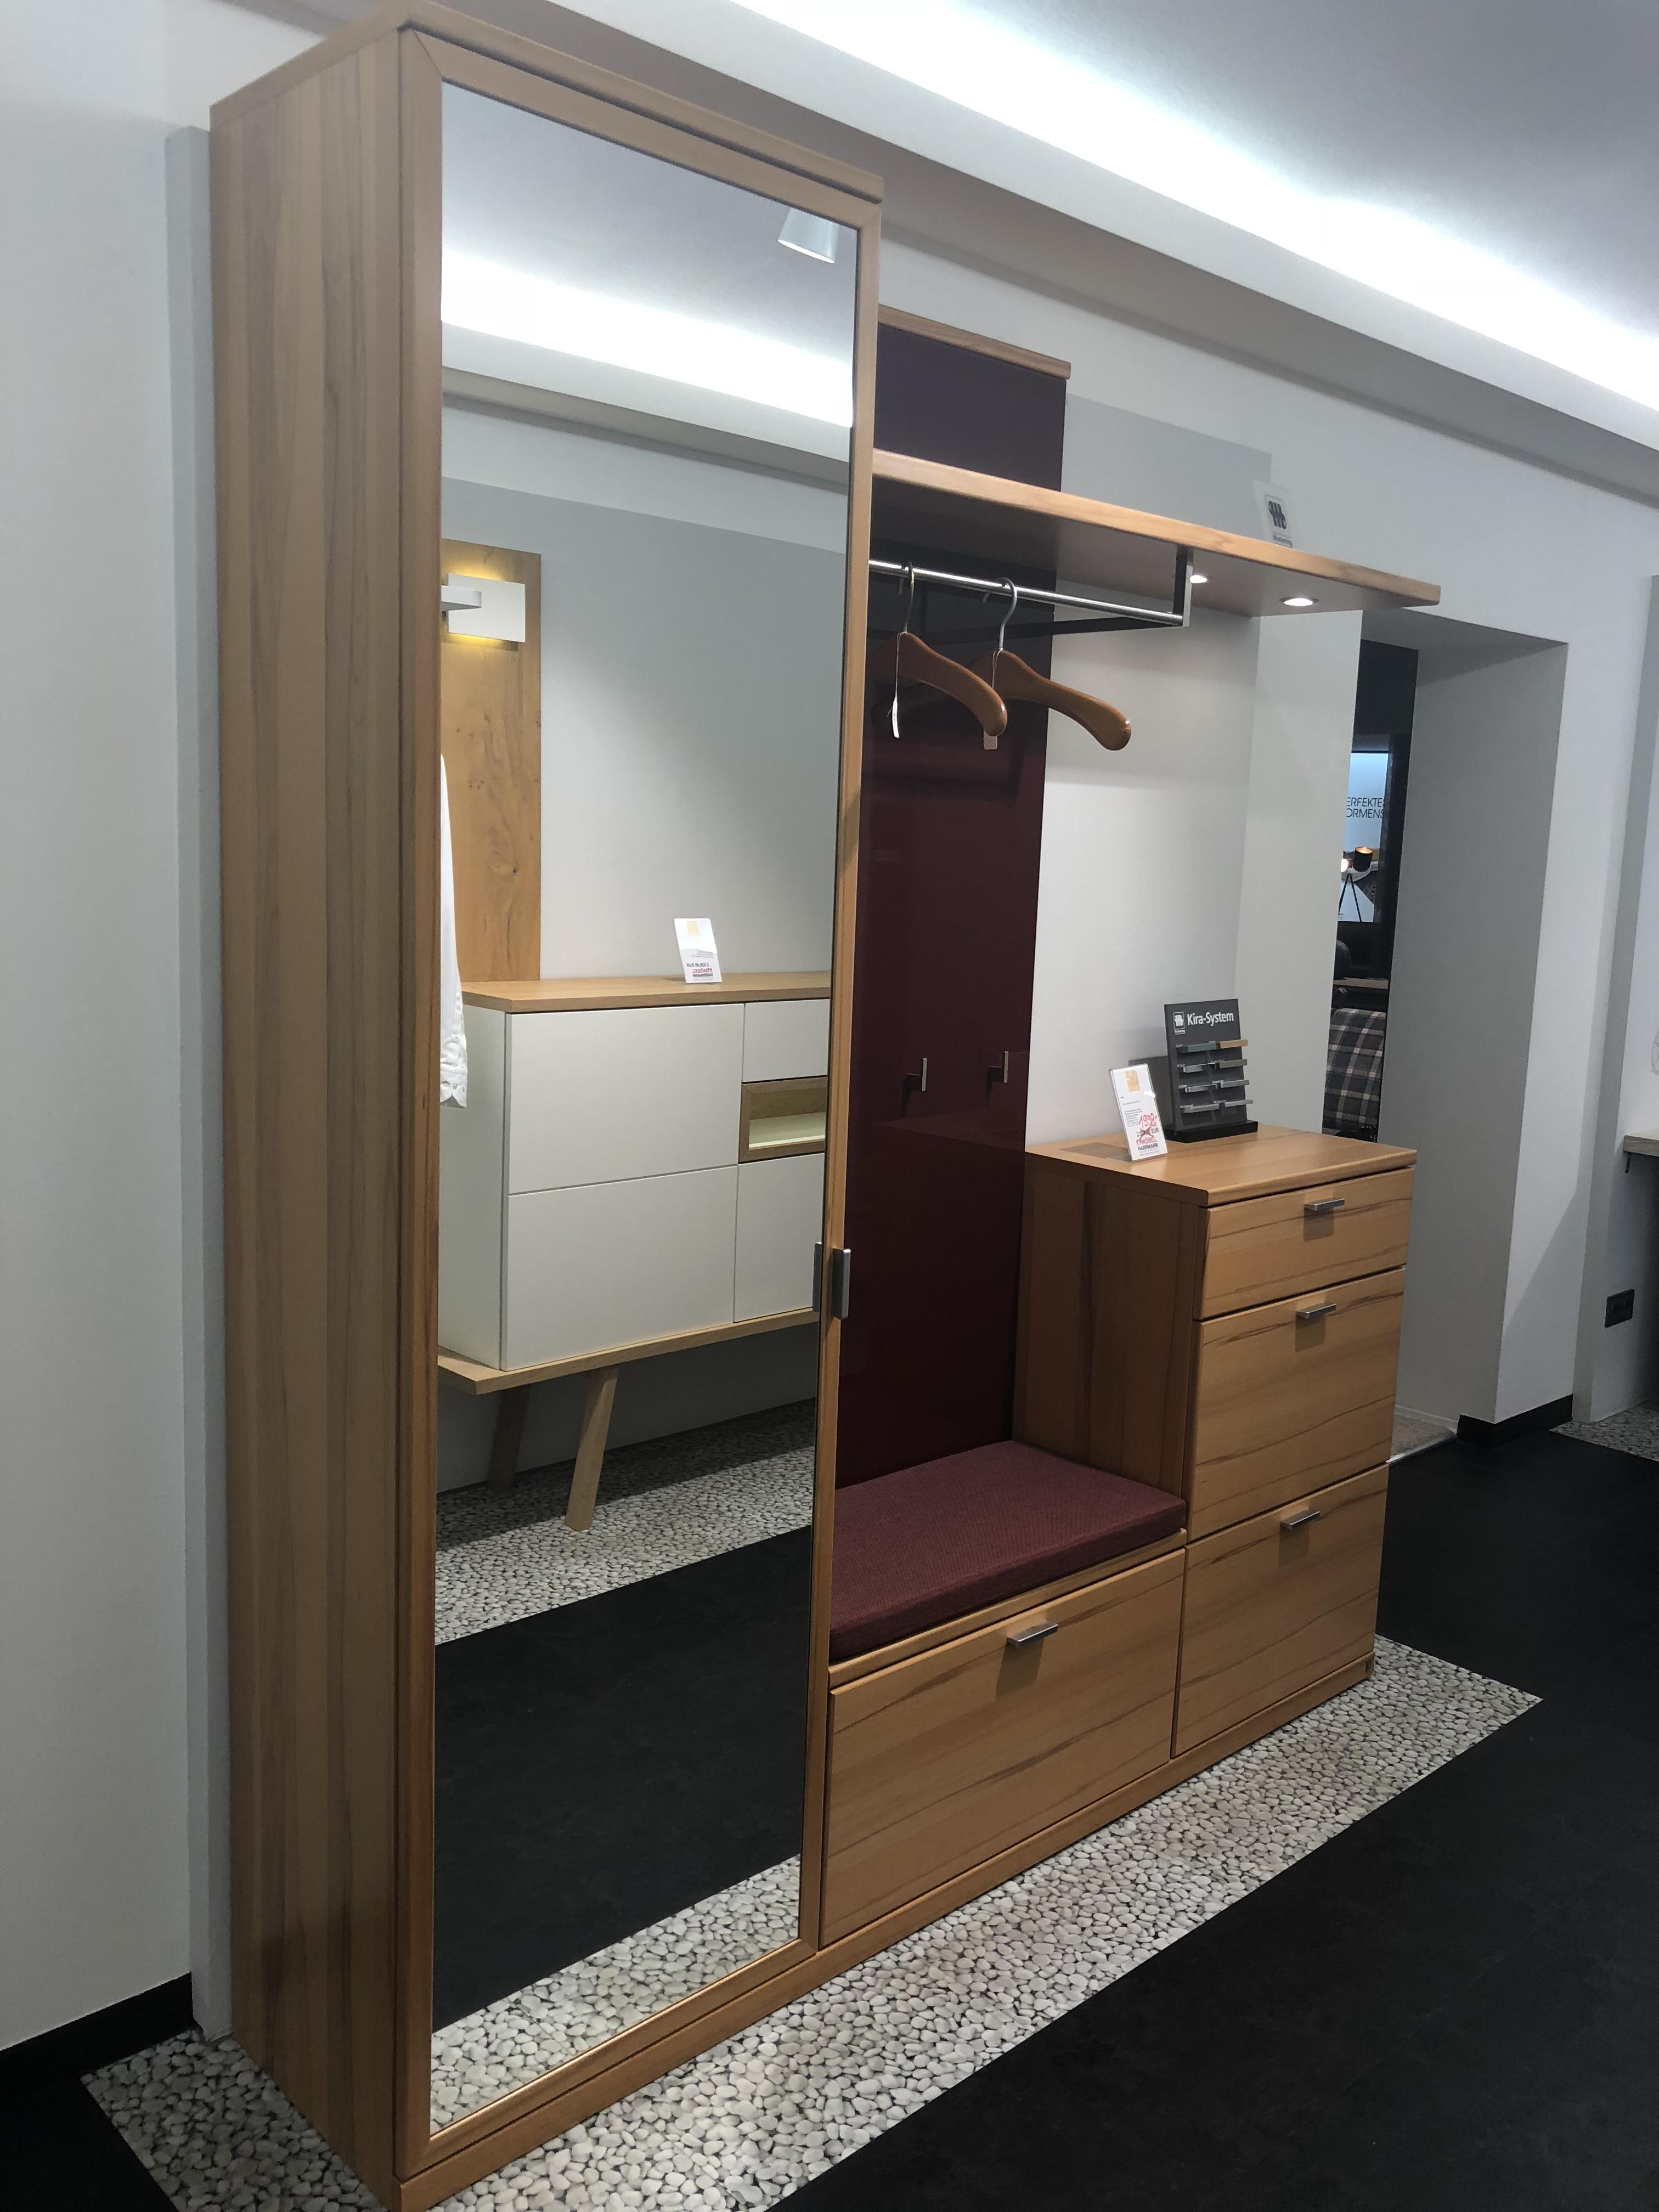 mein ausstellungsst ck musterring diele kira. Black Bedroom Furniture Sets. Home Design Ideas